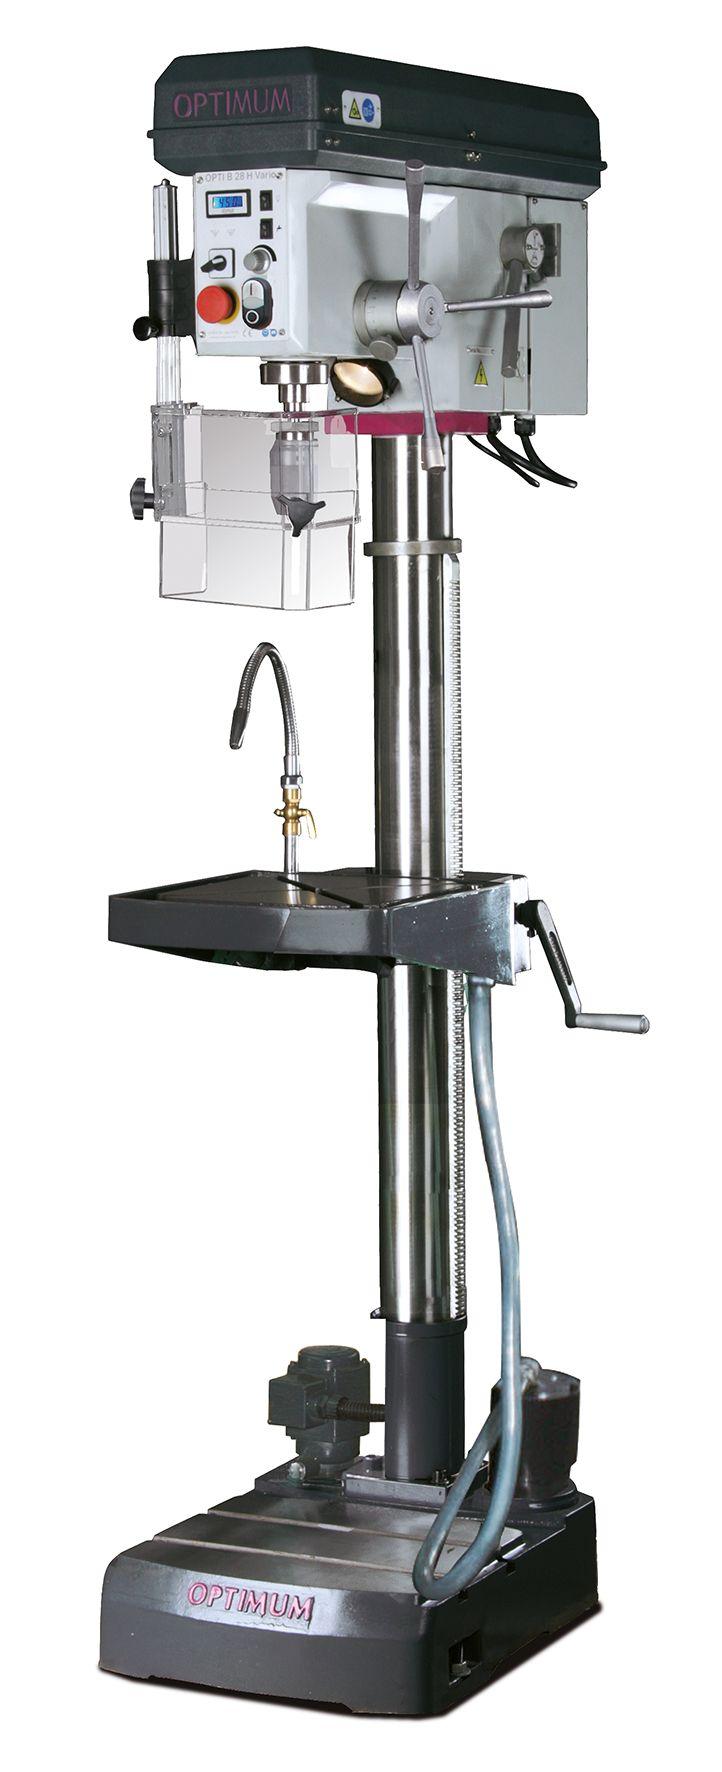 Groovy B28Hv Column Bench Drilling Machines Vynckier Tools Cjindustries Chair Design For Home Cjindustriesco